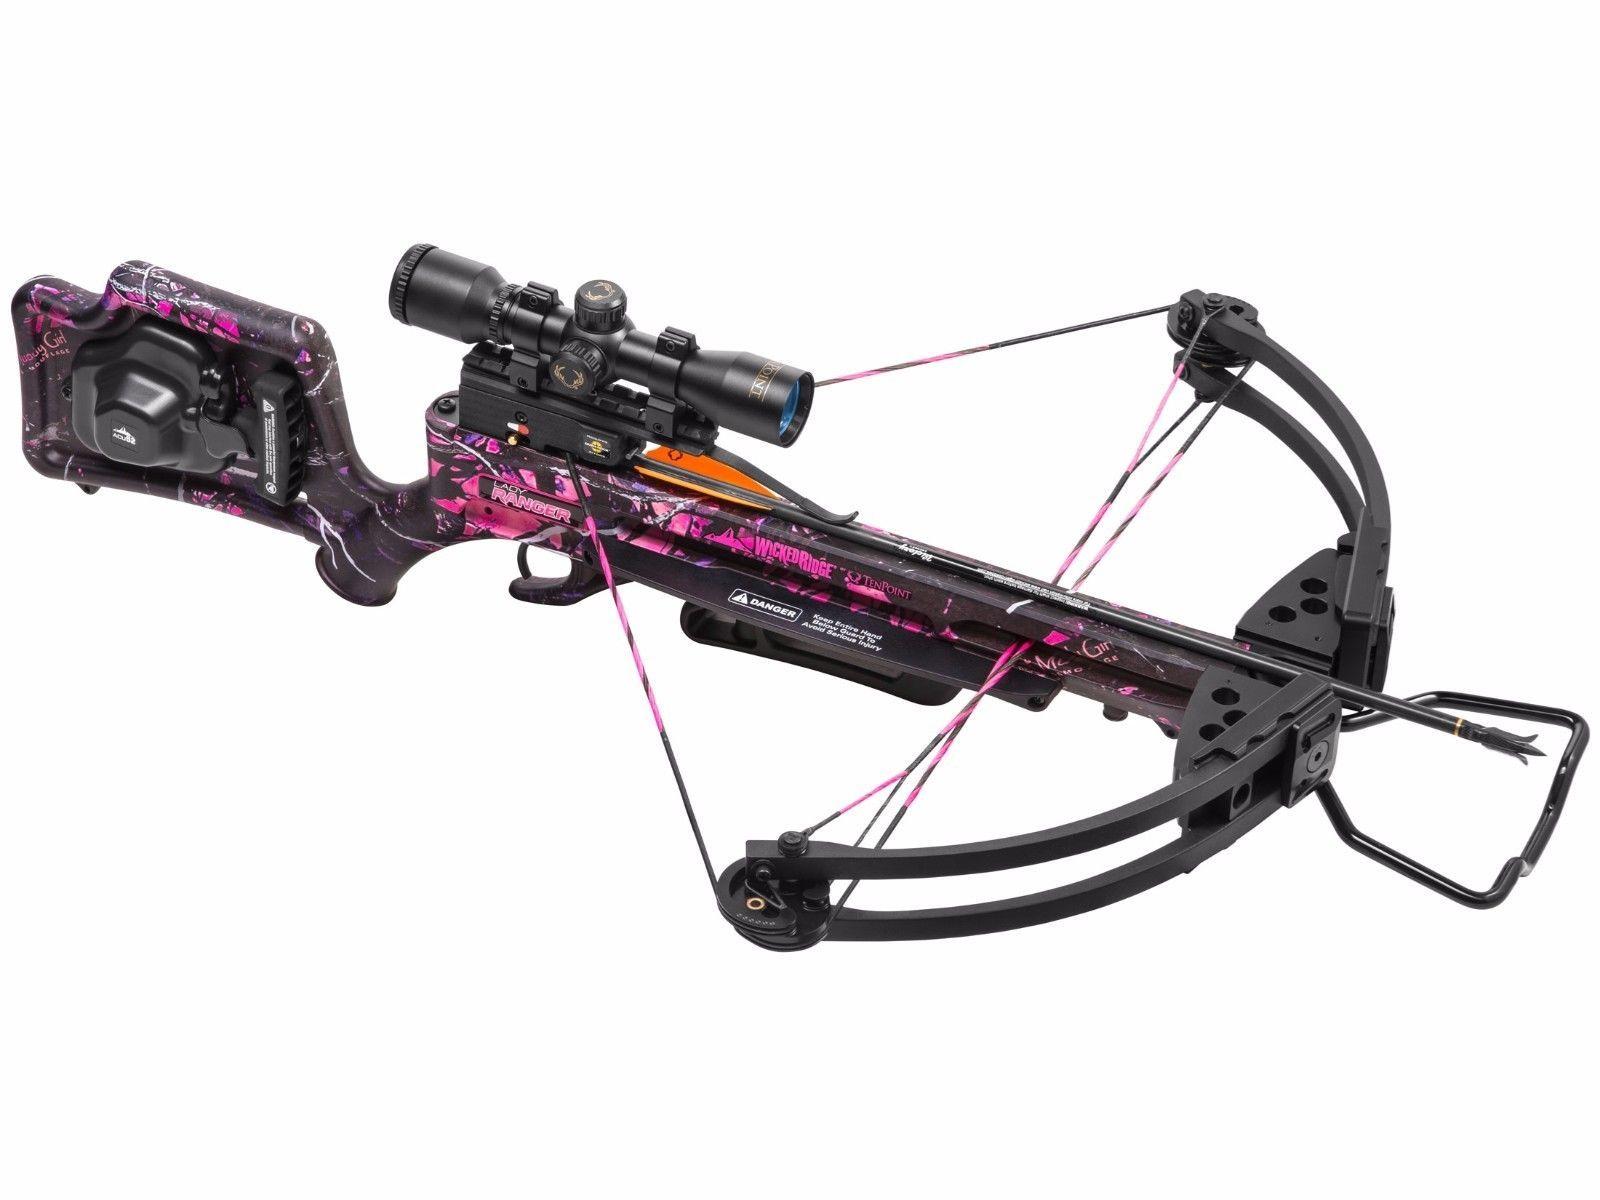 Wicked Ridge by TenPoint Lady Ranger Premium Crossbow with 3x Scope 2726062